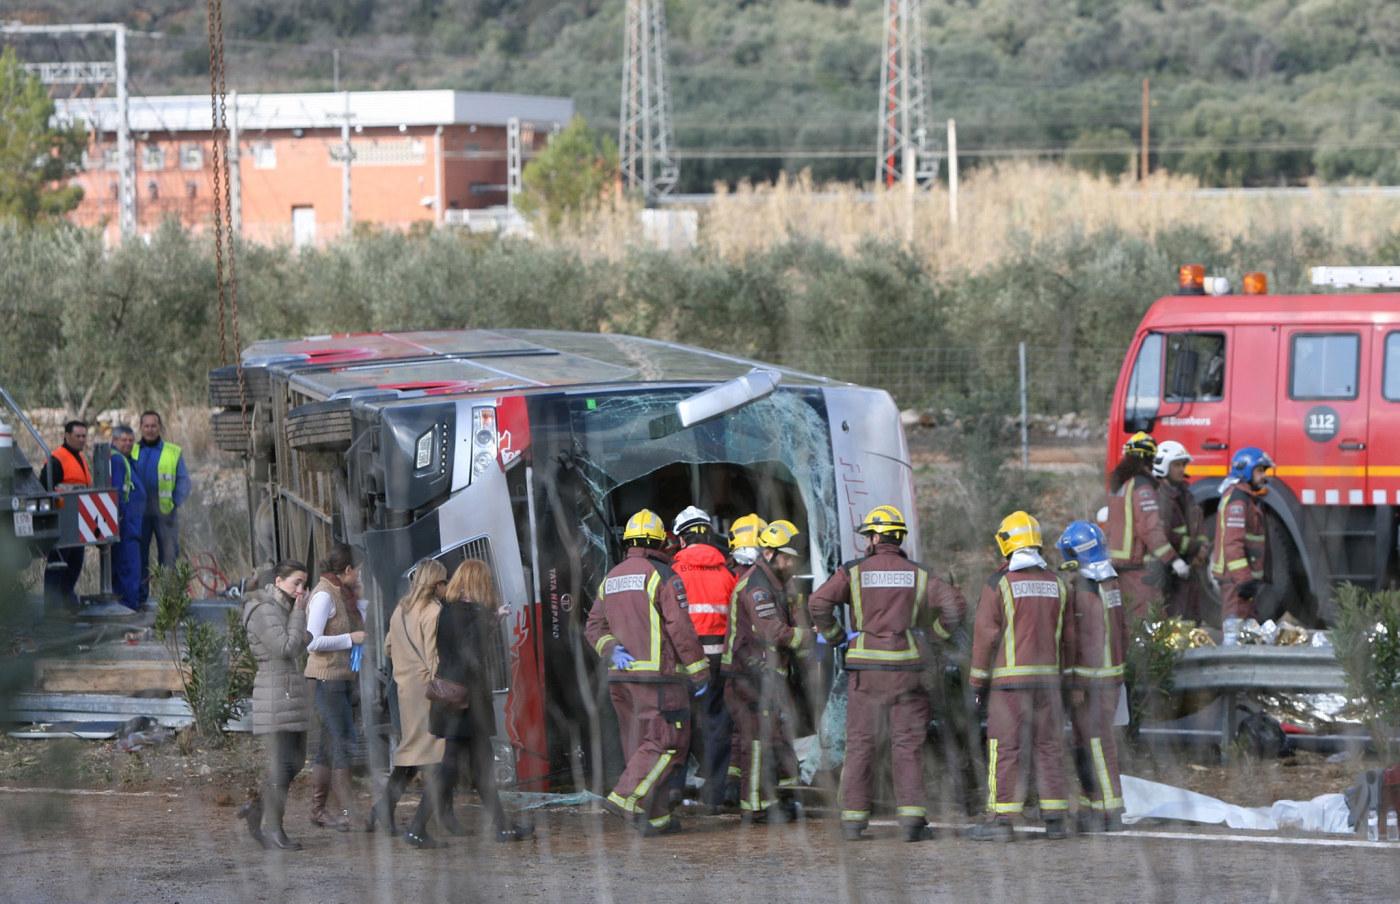 56 doda i indisk bussolycka